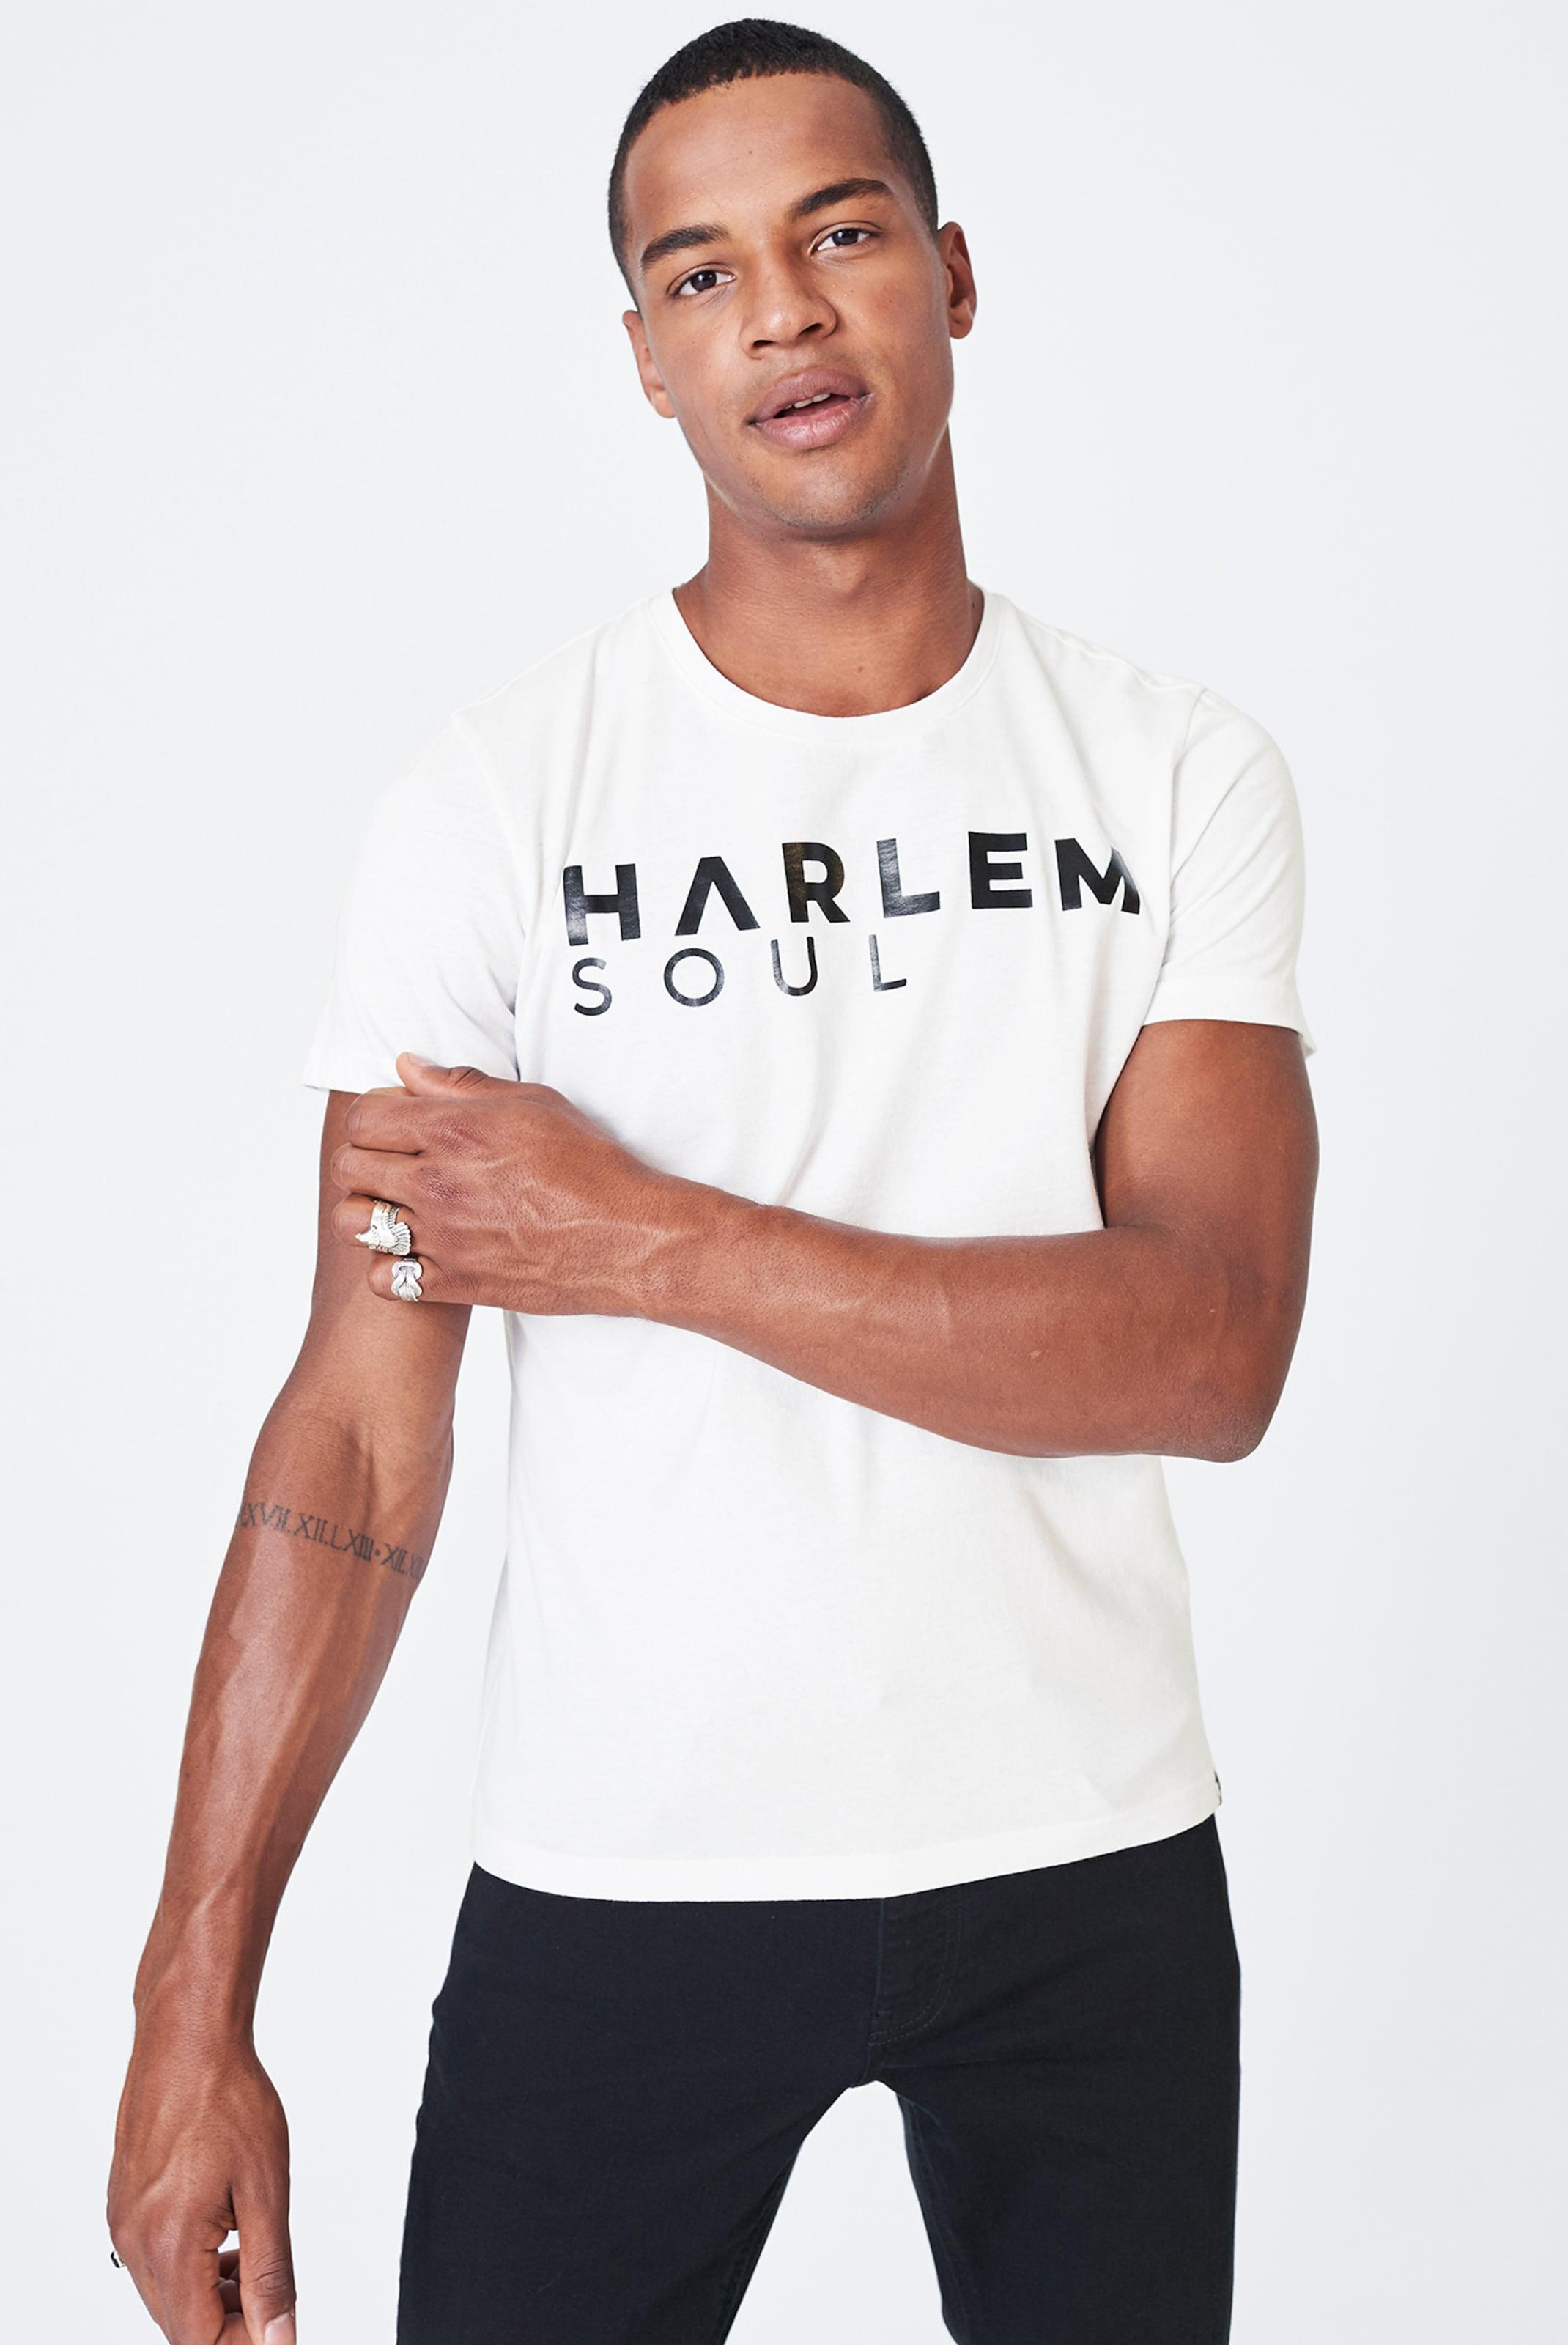 Harlem Soul T-Shirt in weiß Jersey I00045232WHI0001L